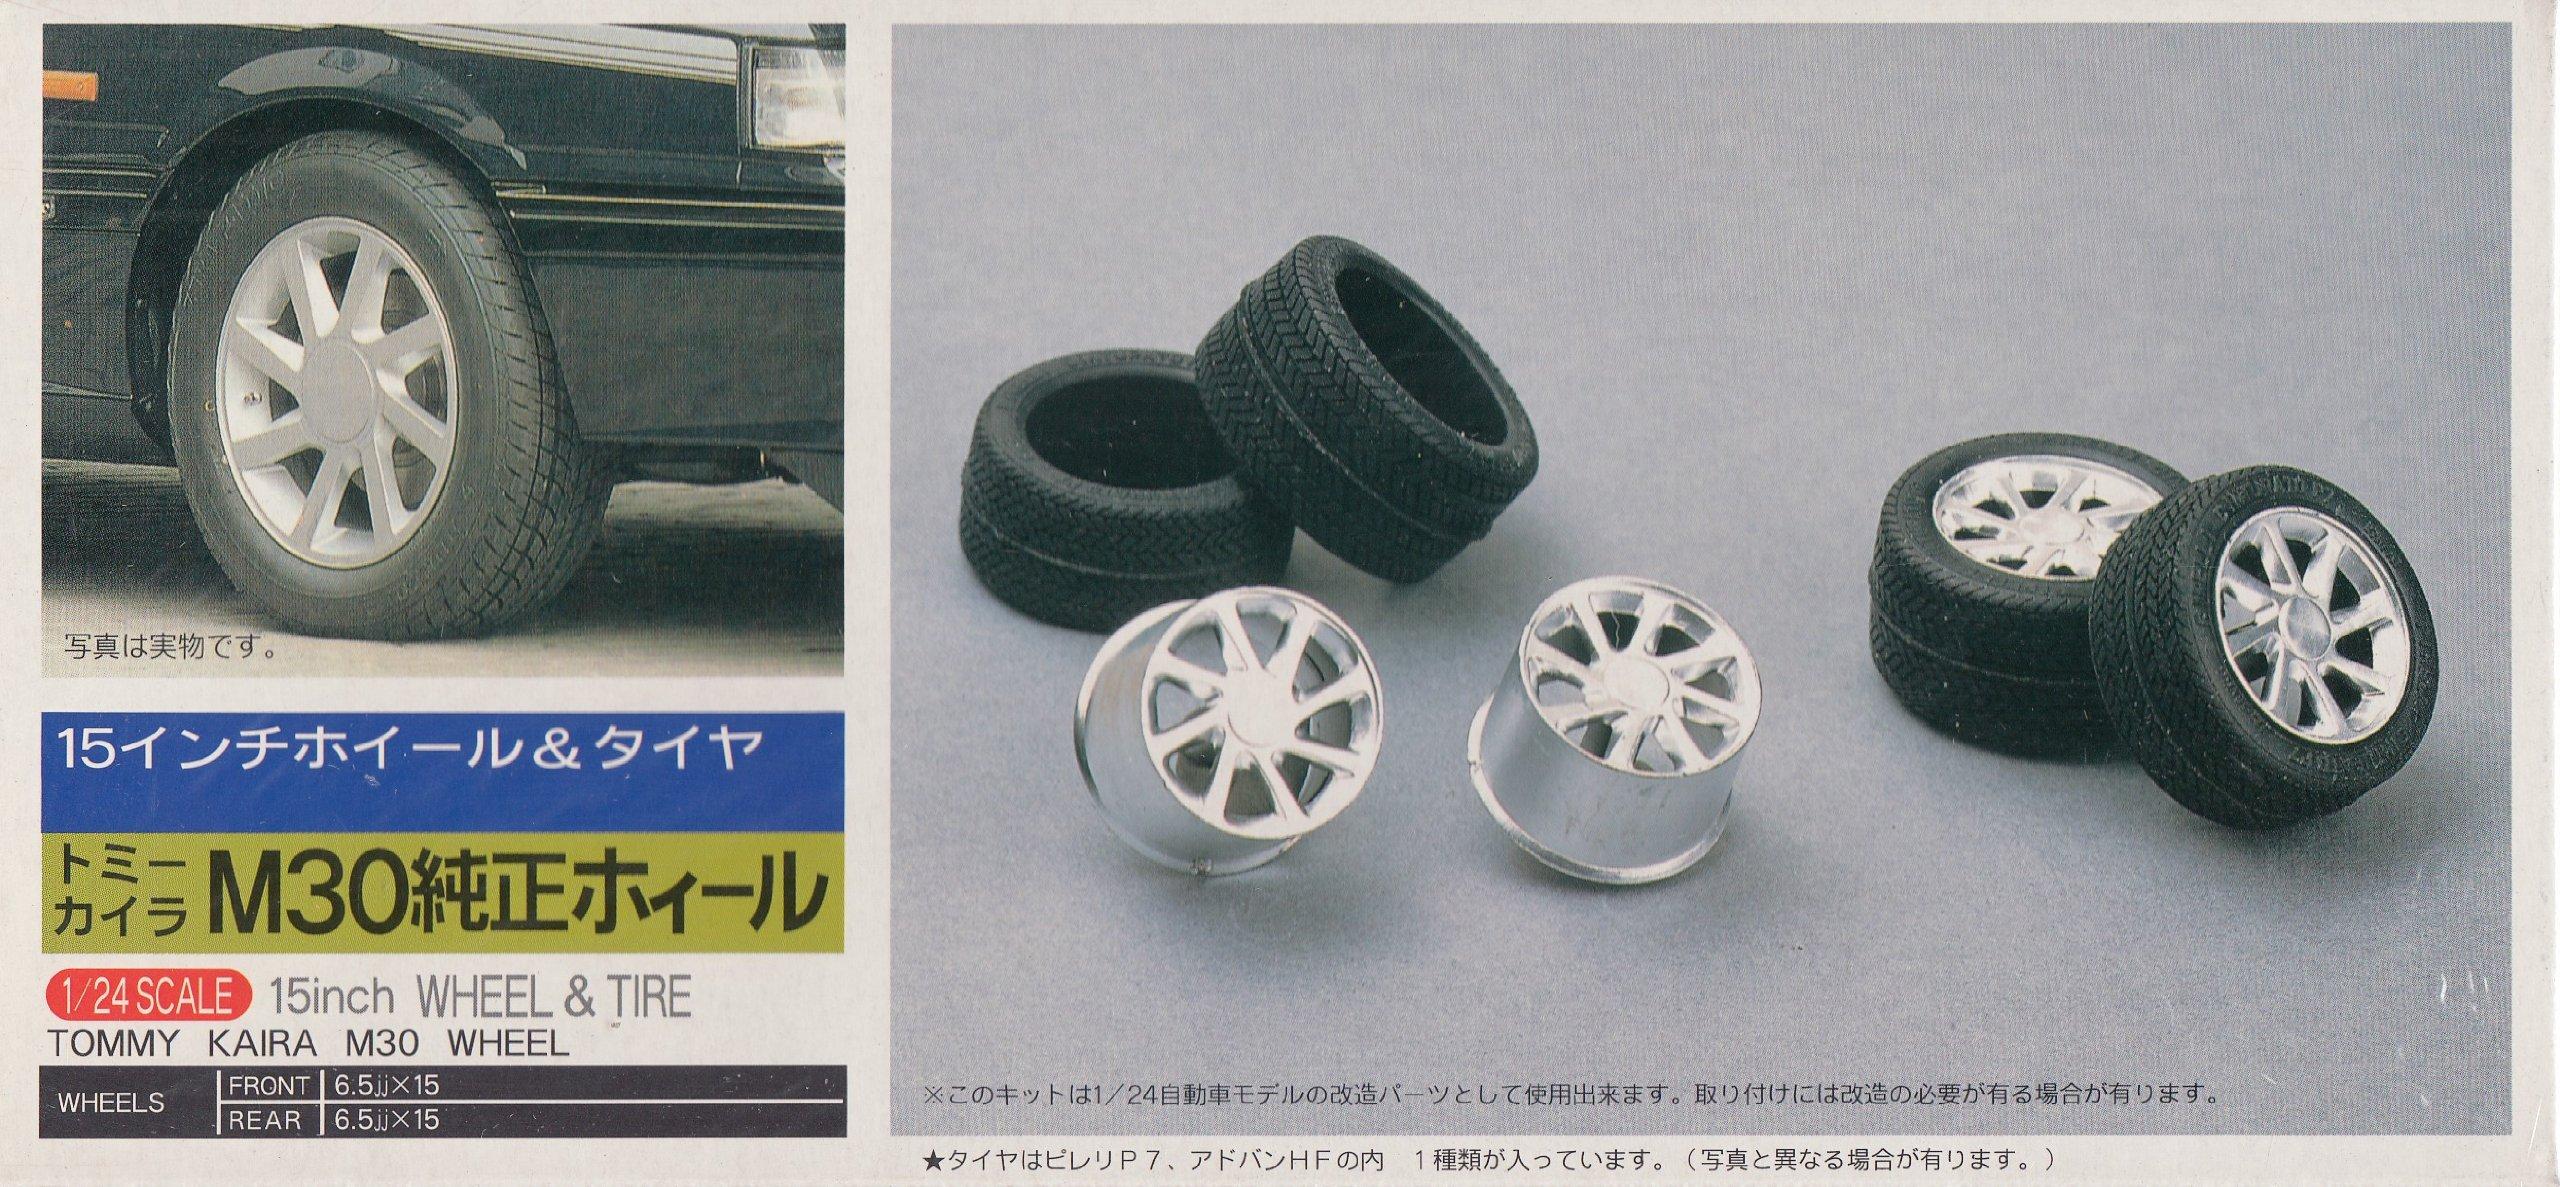 Fujimi FUJ19175 1:24 Tommy Kaira M30 15inch Wheel & Tire Set Model KIT Accessory